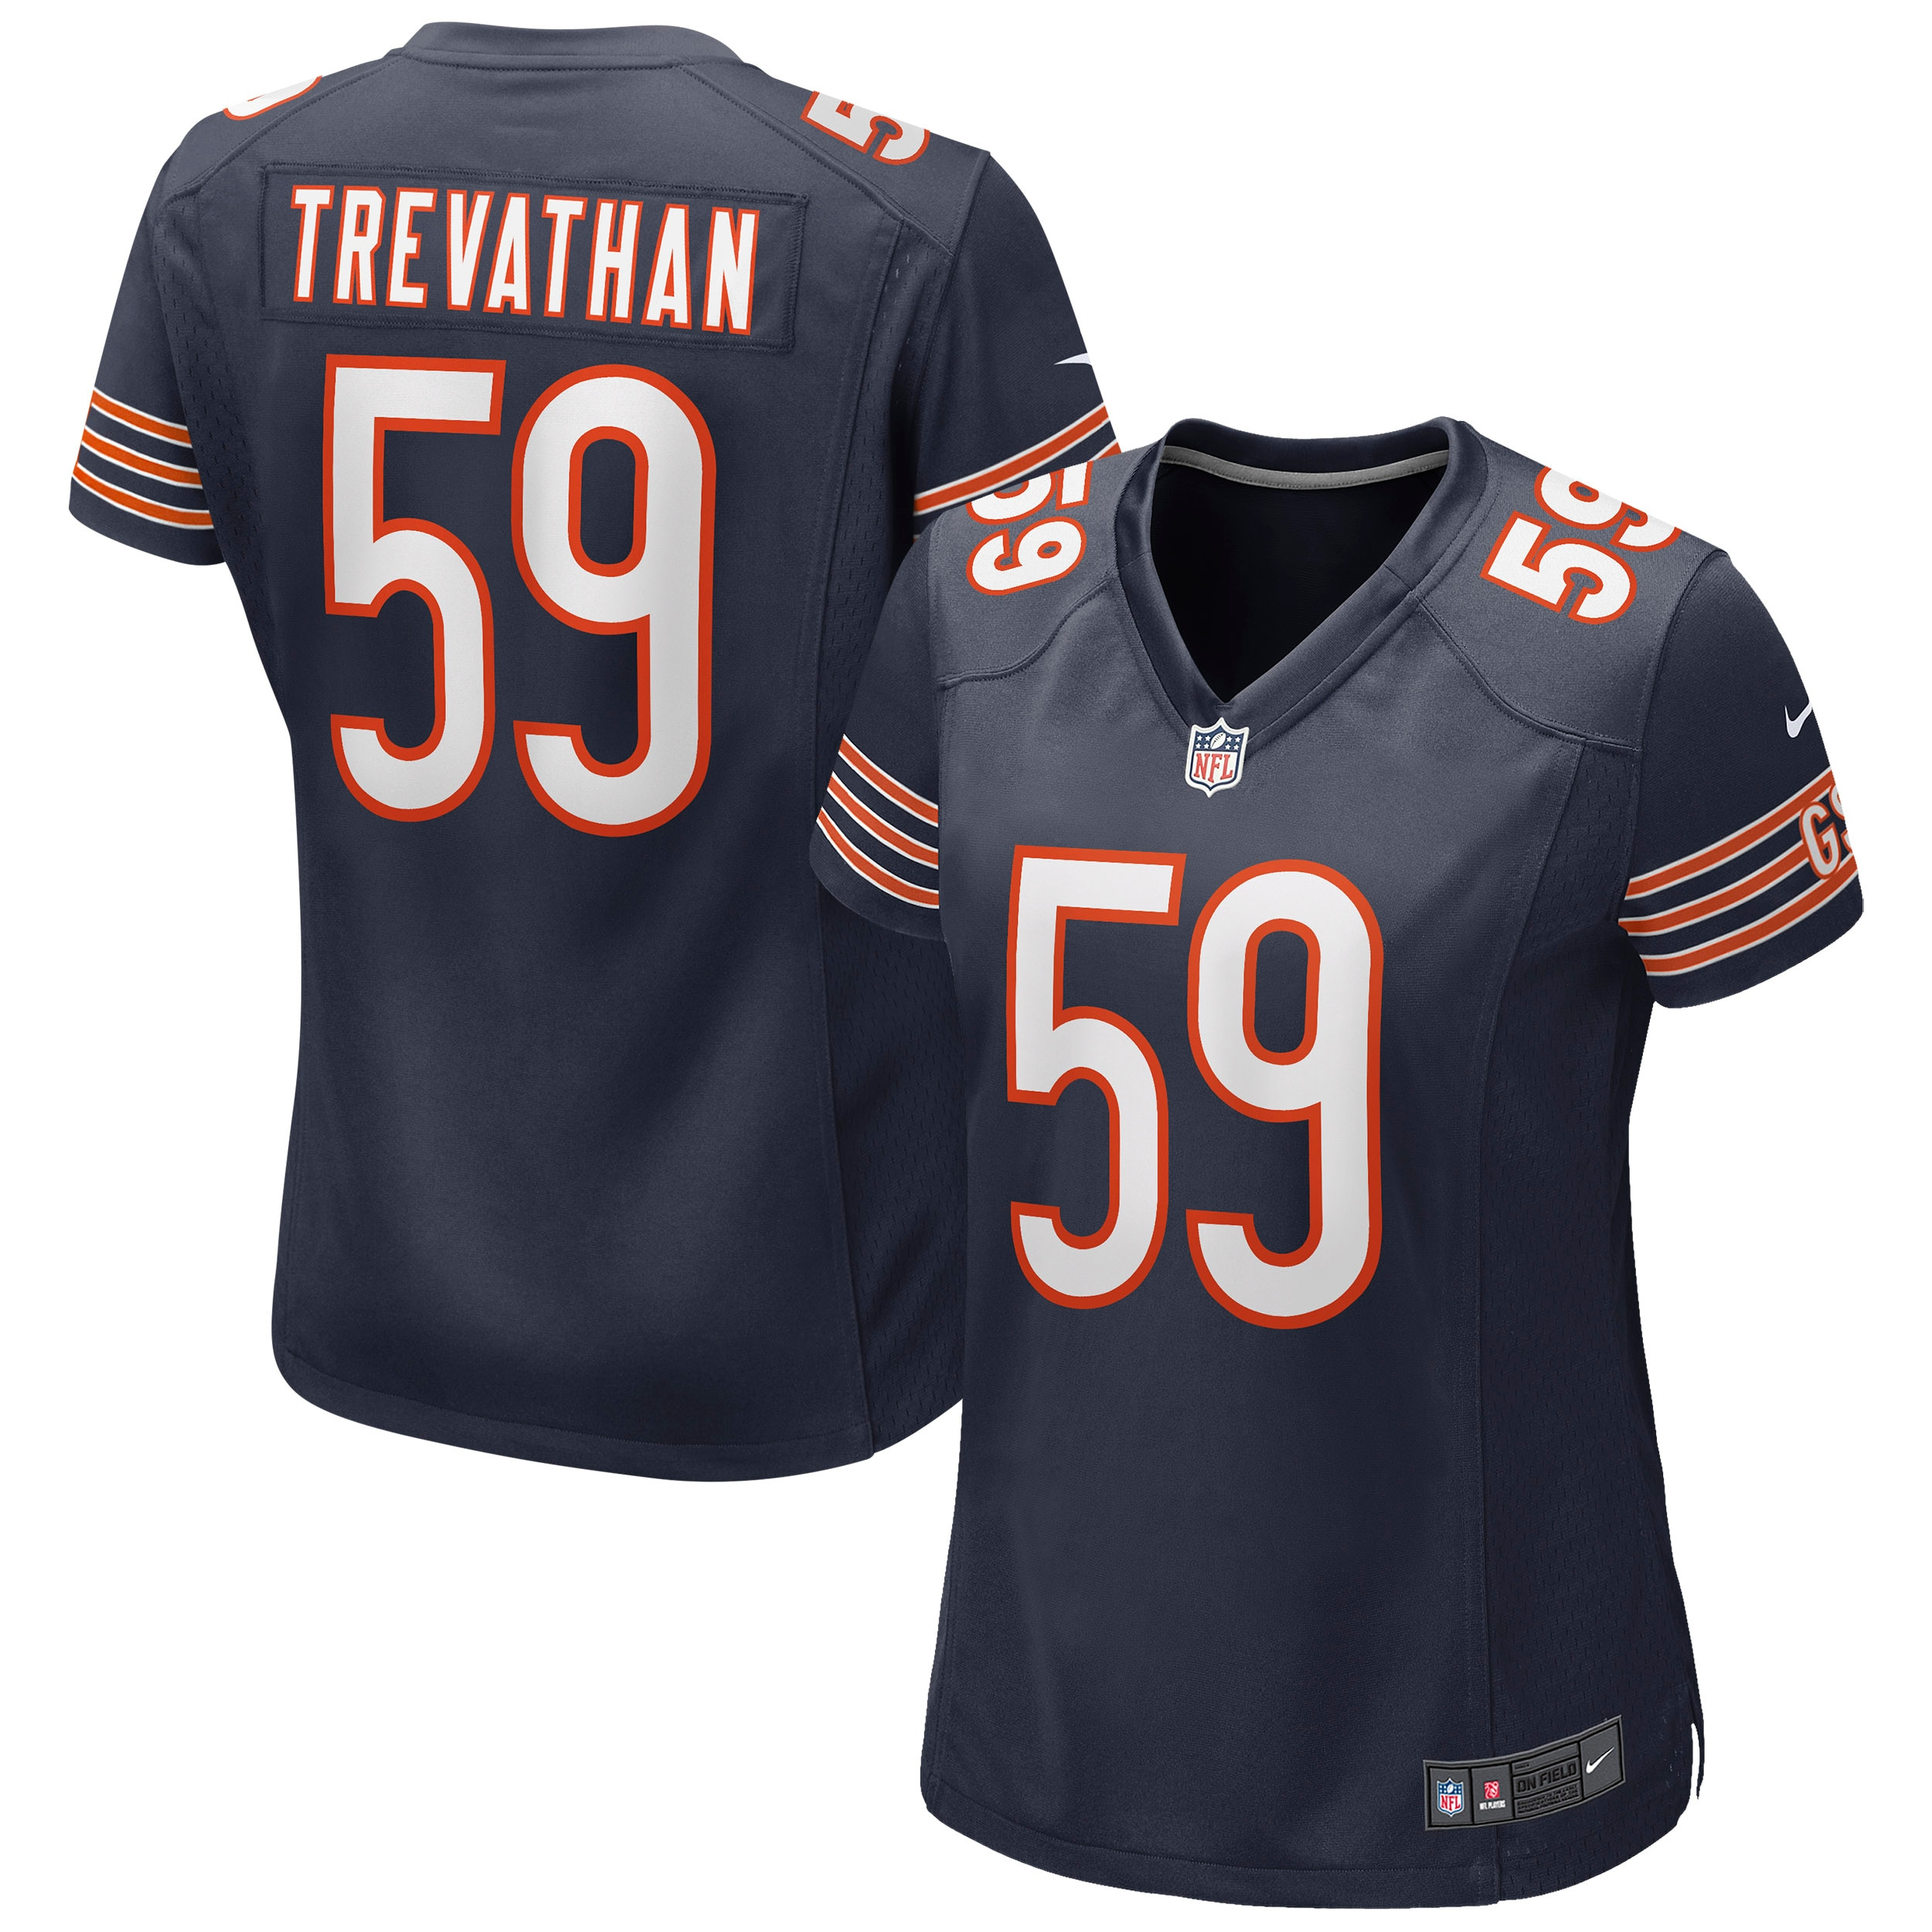 Danny Trevathan Chicago Bears Nike Women's Game Jersey - Navy - Walmart.com